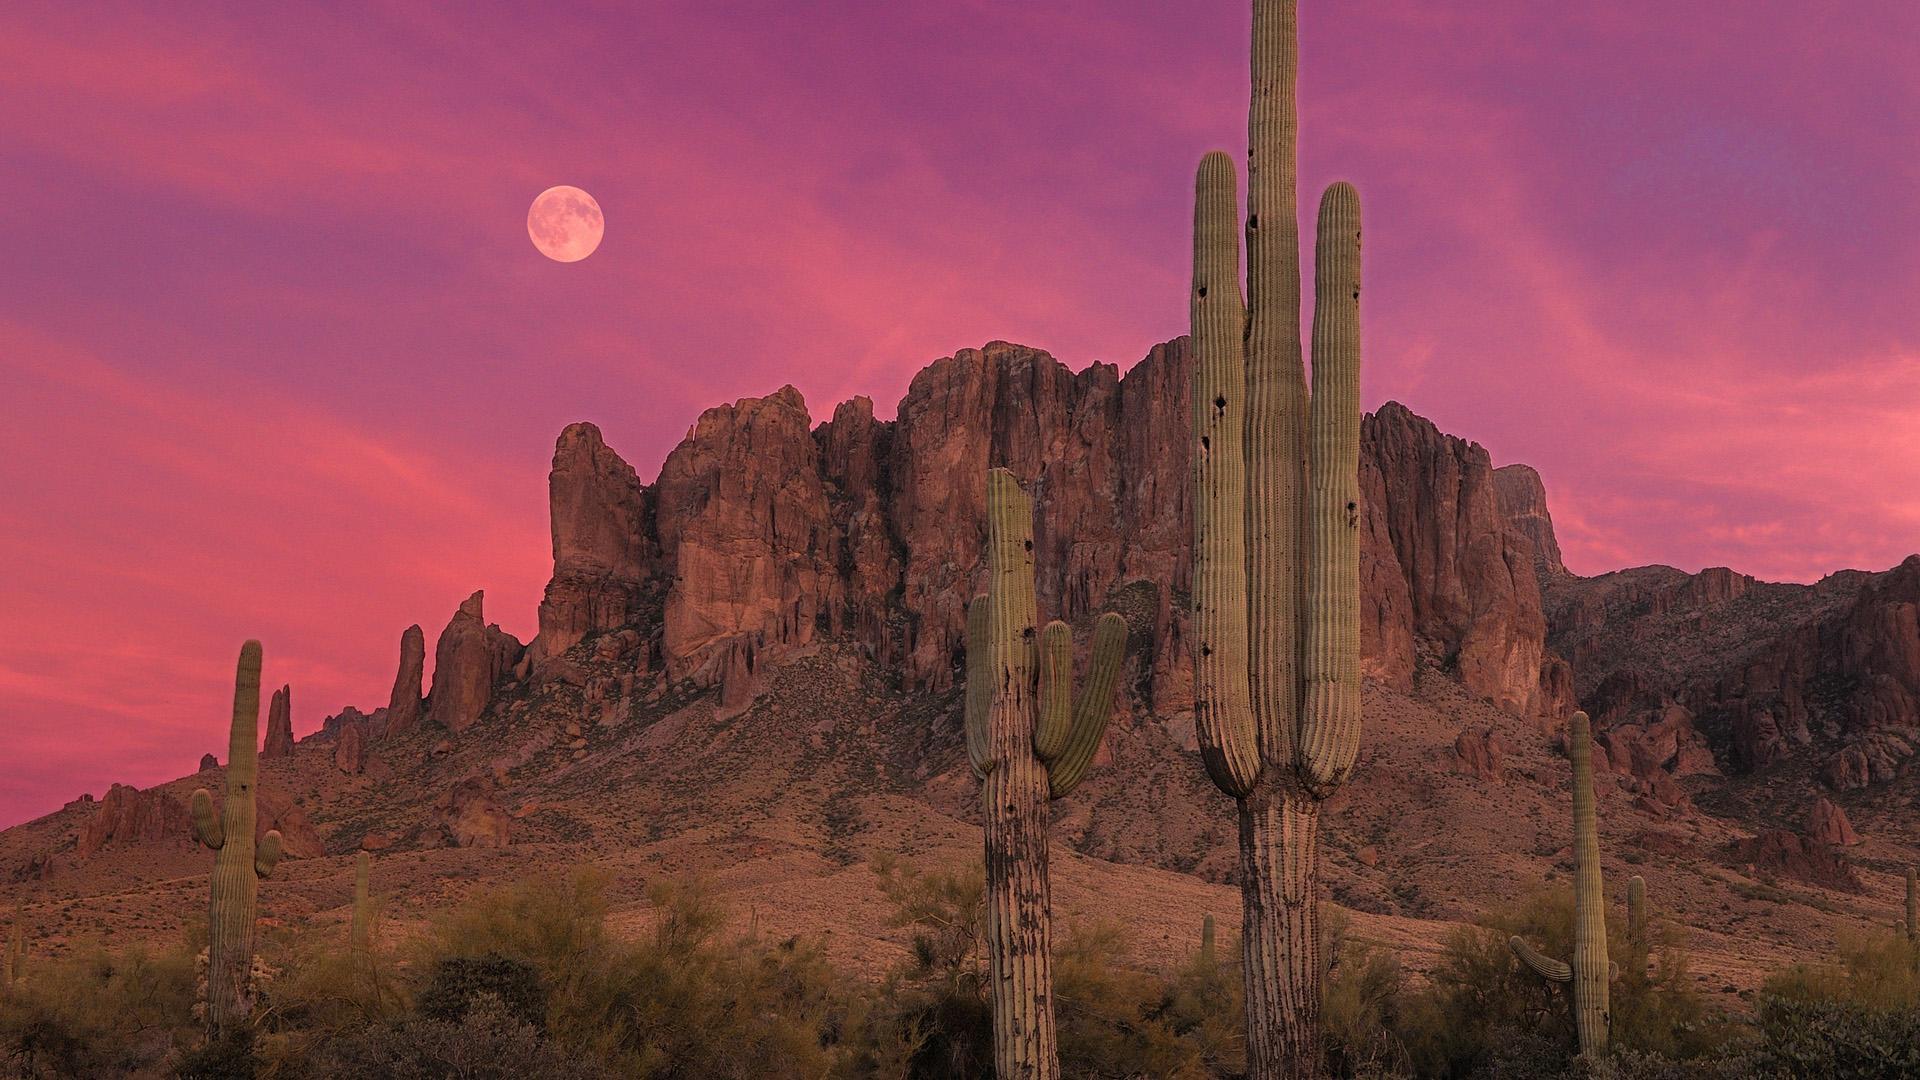 Fall Hd Wallpapers 1080p Widescreen Arizona Wallpaper For Desktop Pixelstalk Net